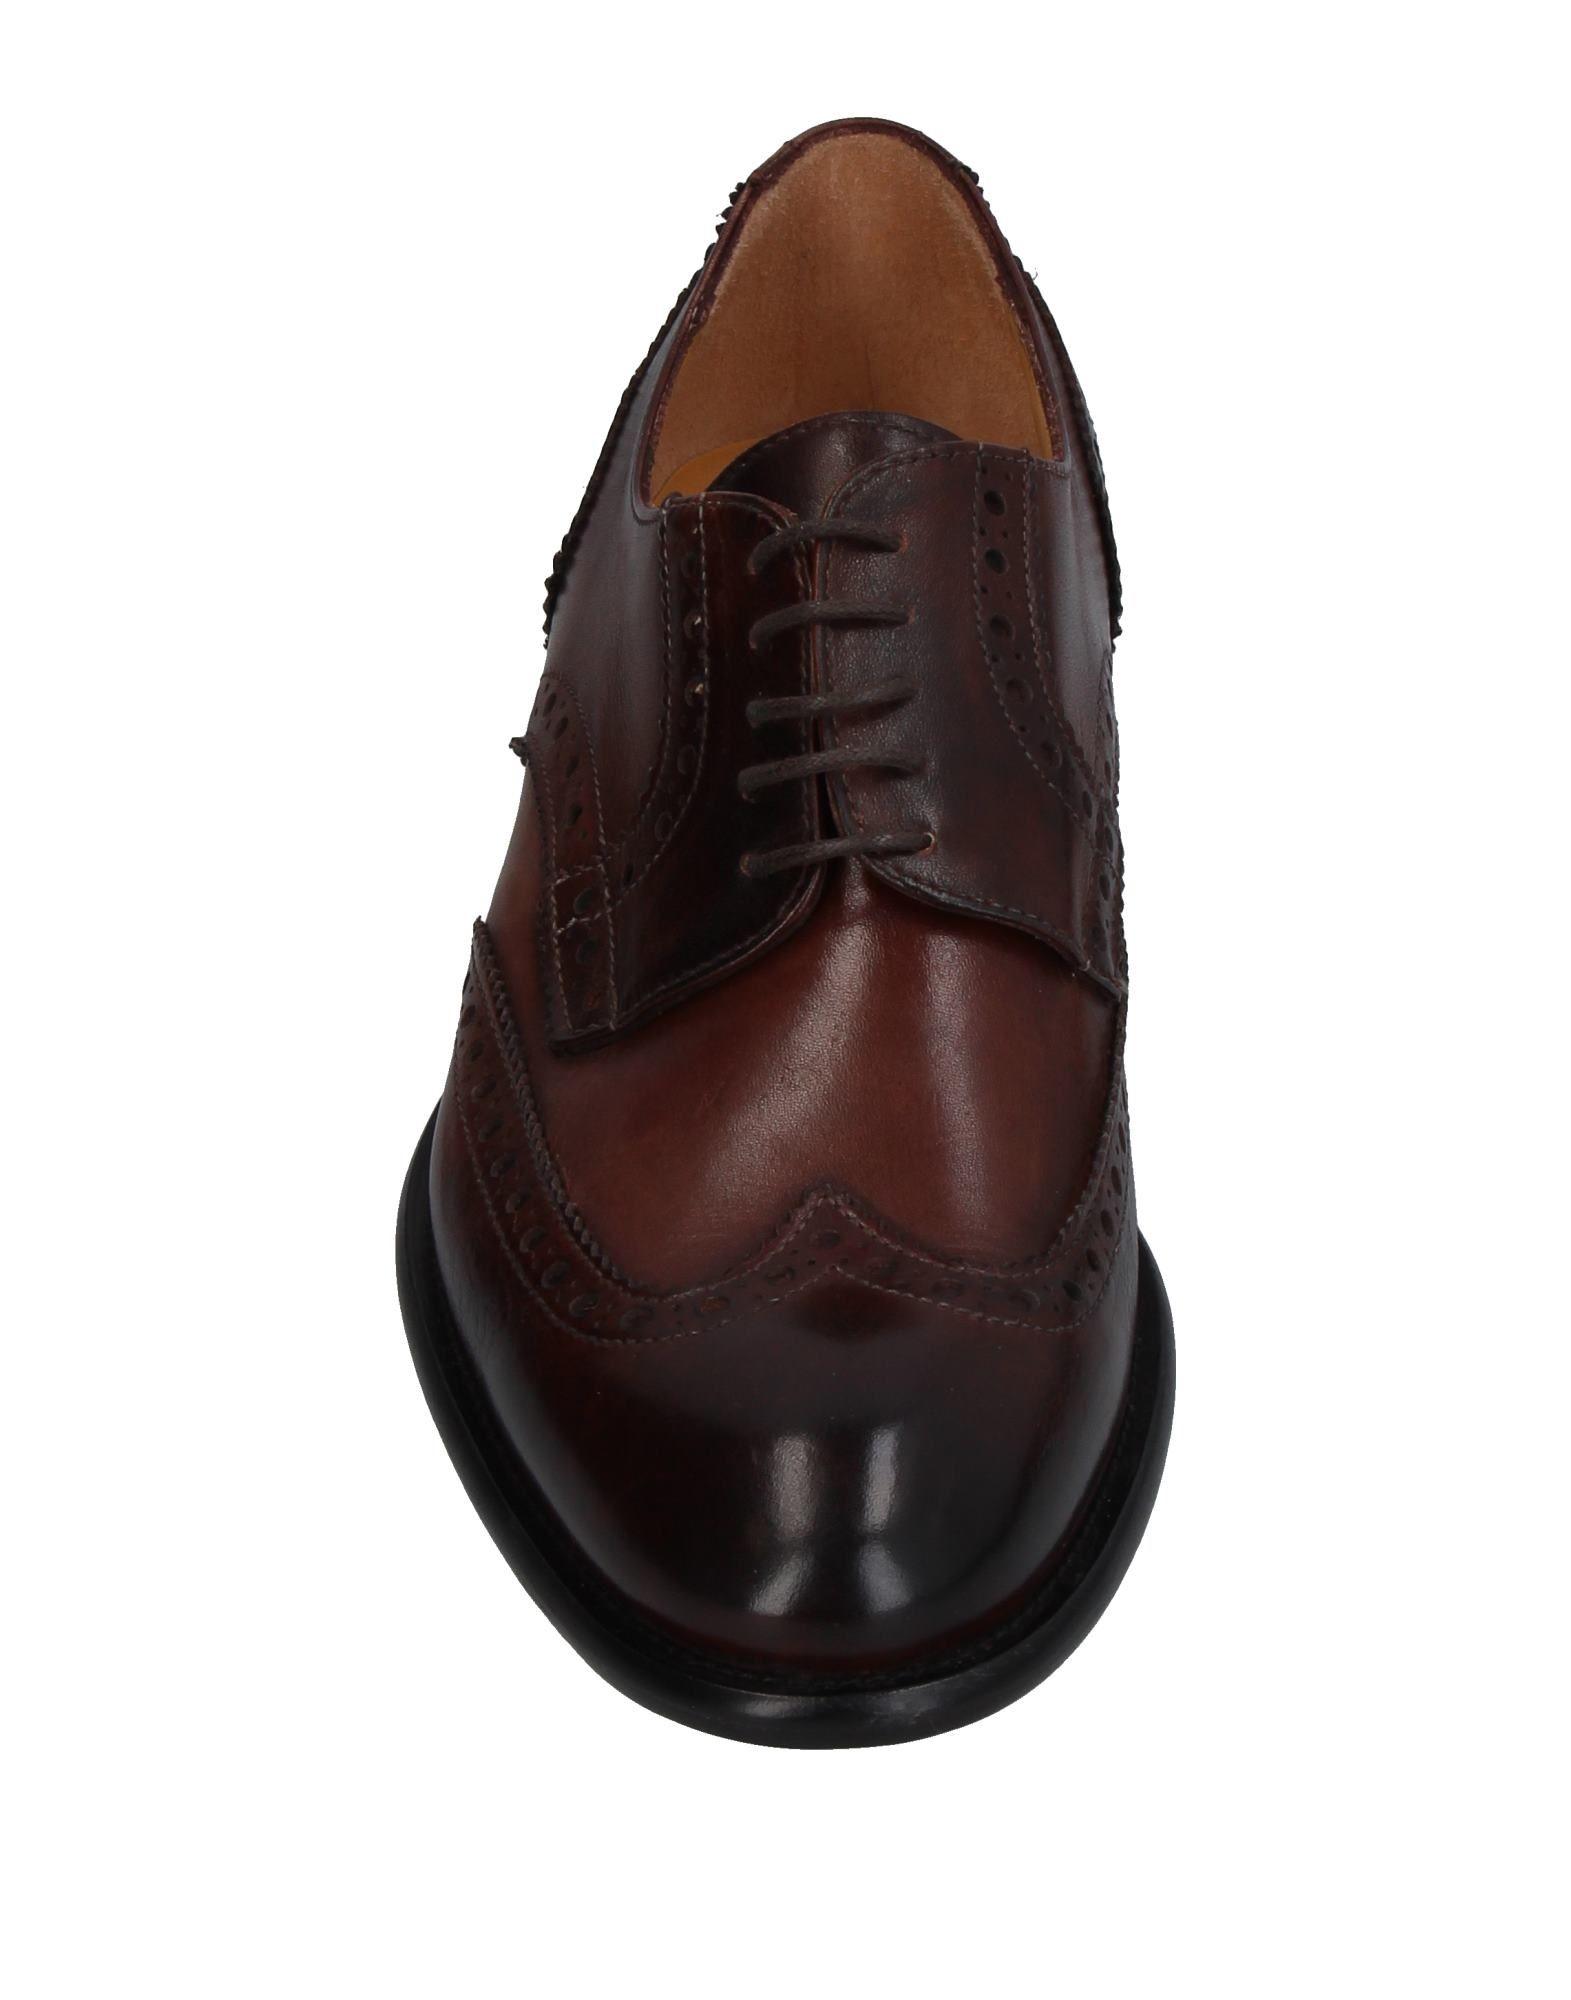 Rabatt echte Schnürschuhe Schuhe Brawn's Schnürschuhe echte Herren  11411410TD aad725